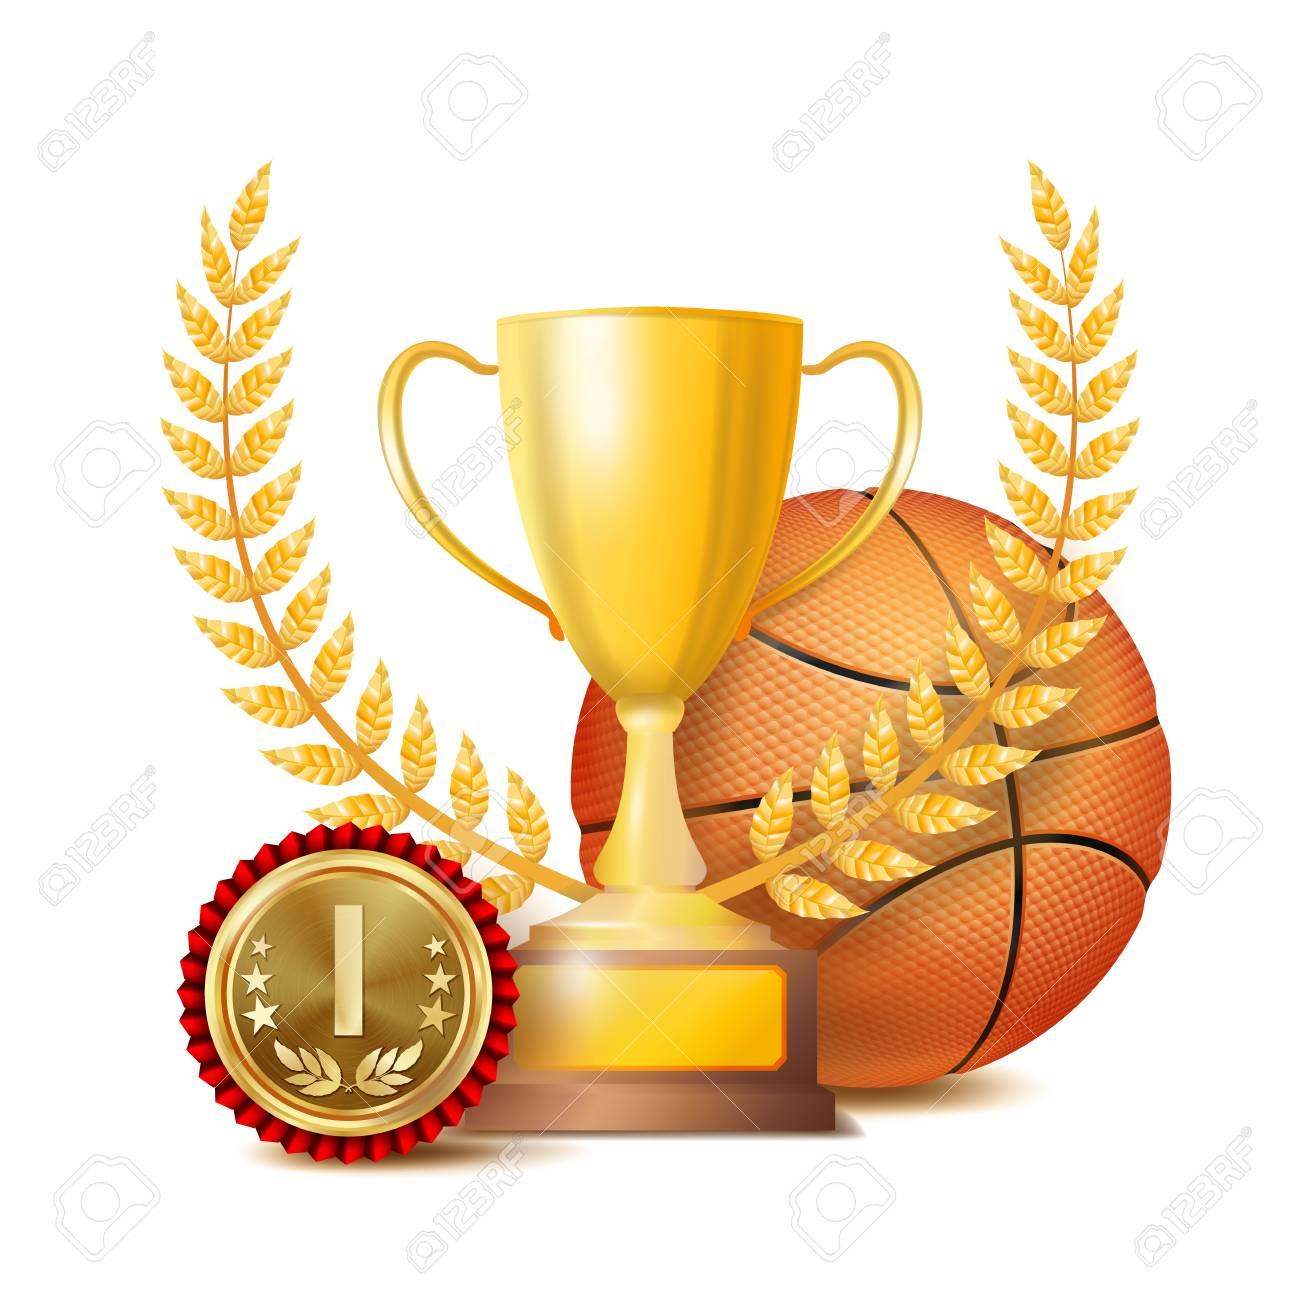 Basketball Award Vector Sport Banner Background Orange Ball Gold Winner Trophy Cup